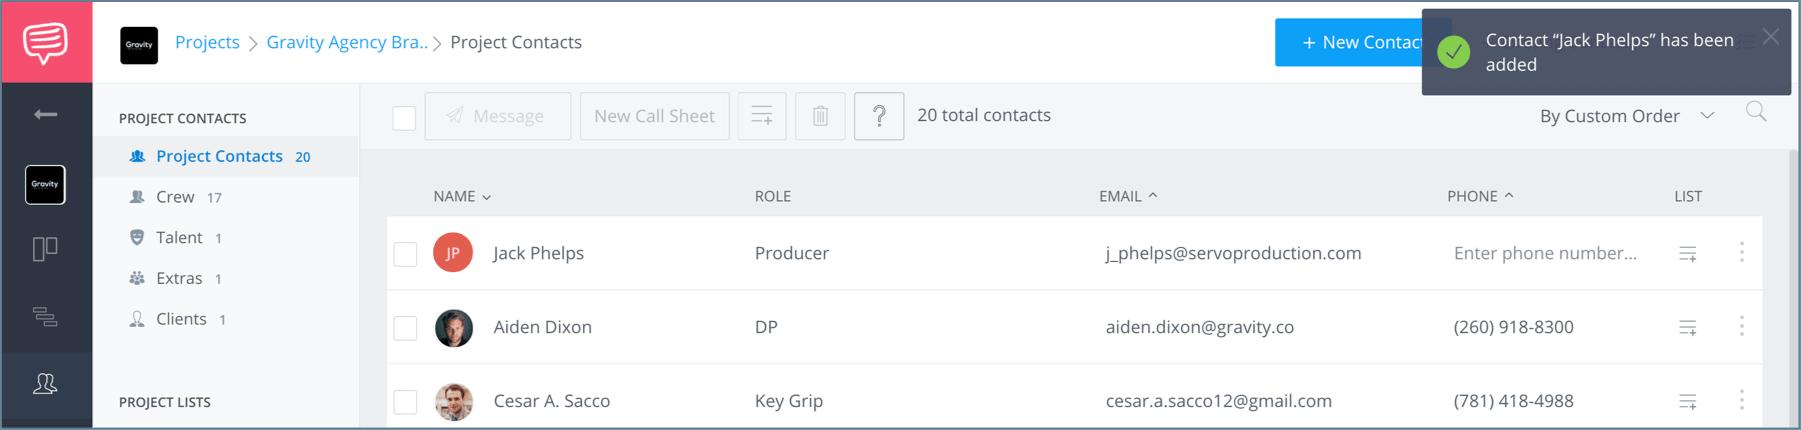 Create a FREE Film Film Production Crew Contact Sheet - StudioBinder - 14